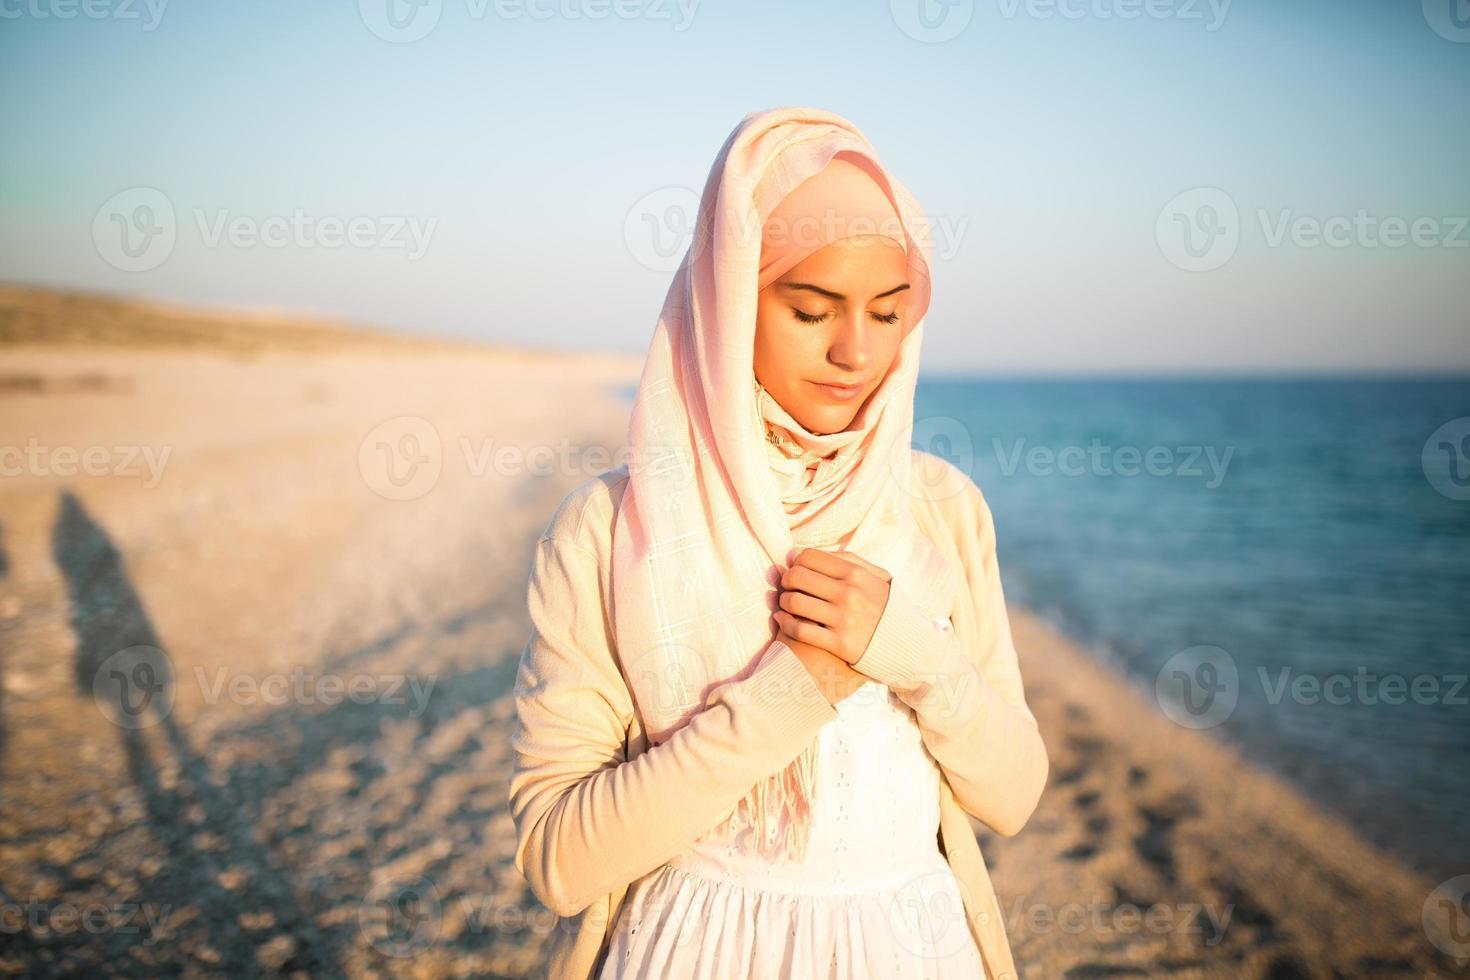 Humble muslim woman praying on the beach.Spiritual religious woman photo